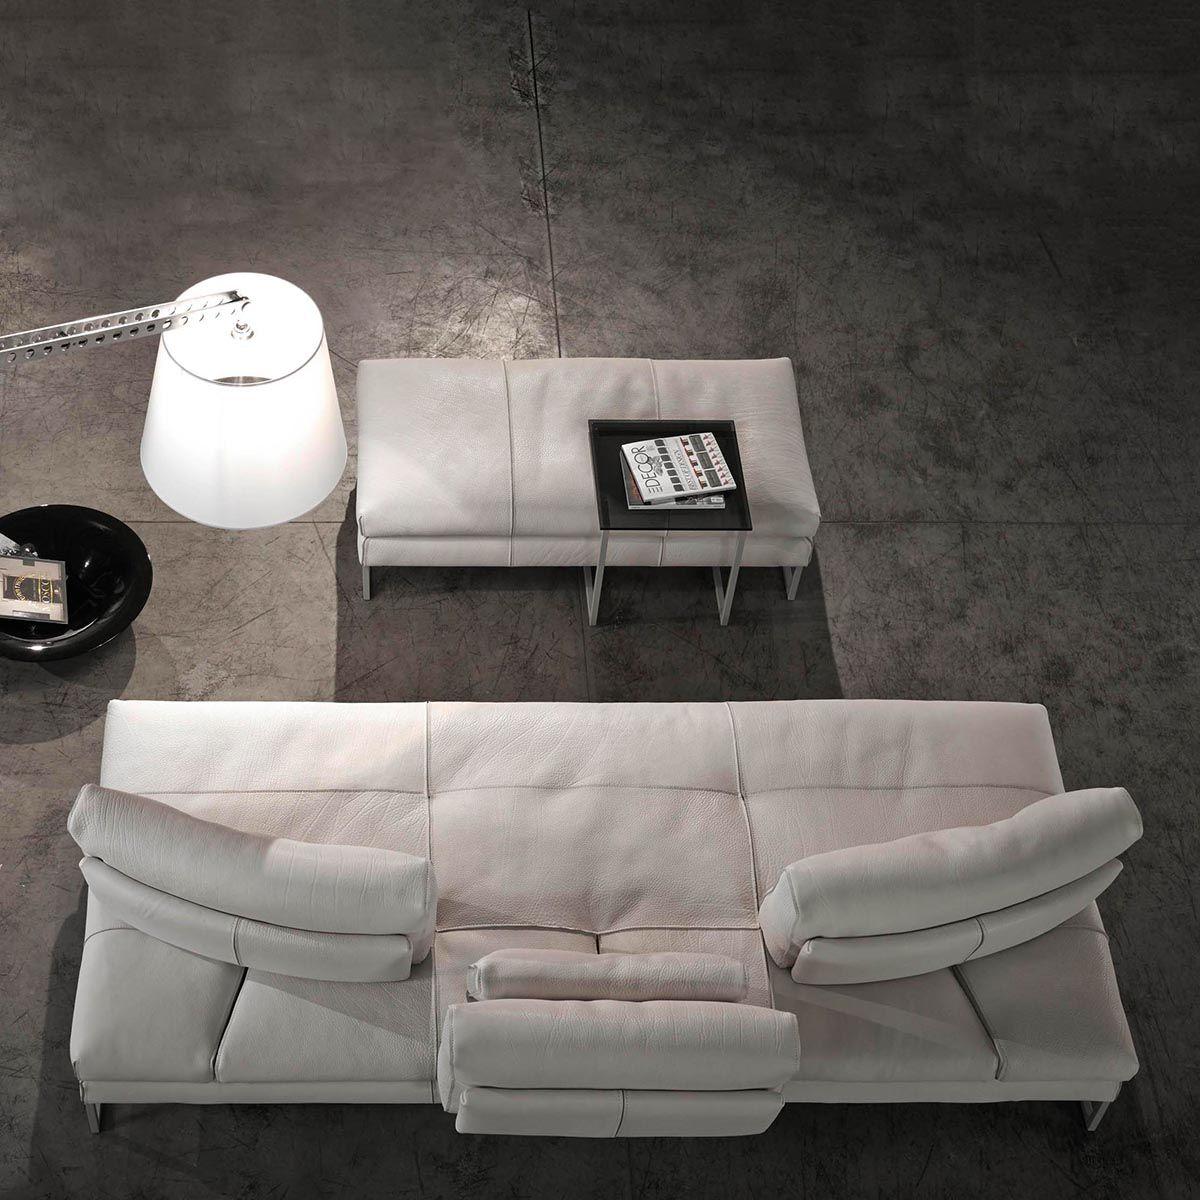 Sunset Design Depot Furniture Furniture Miami Showroom Furniture Lounge Furniture Scandinavian Sofas